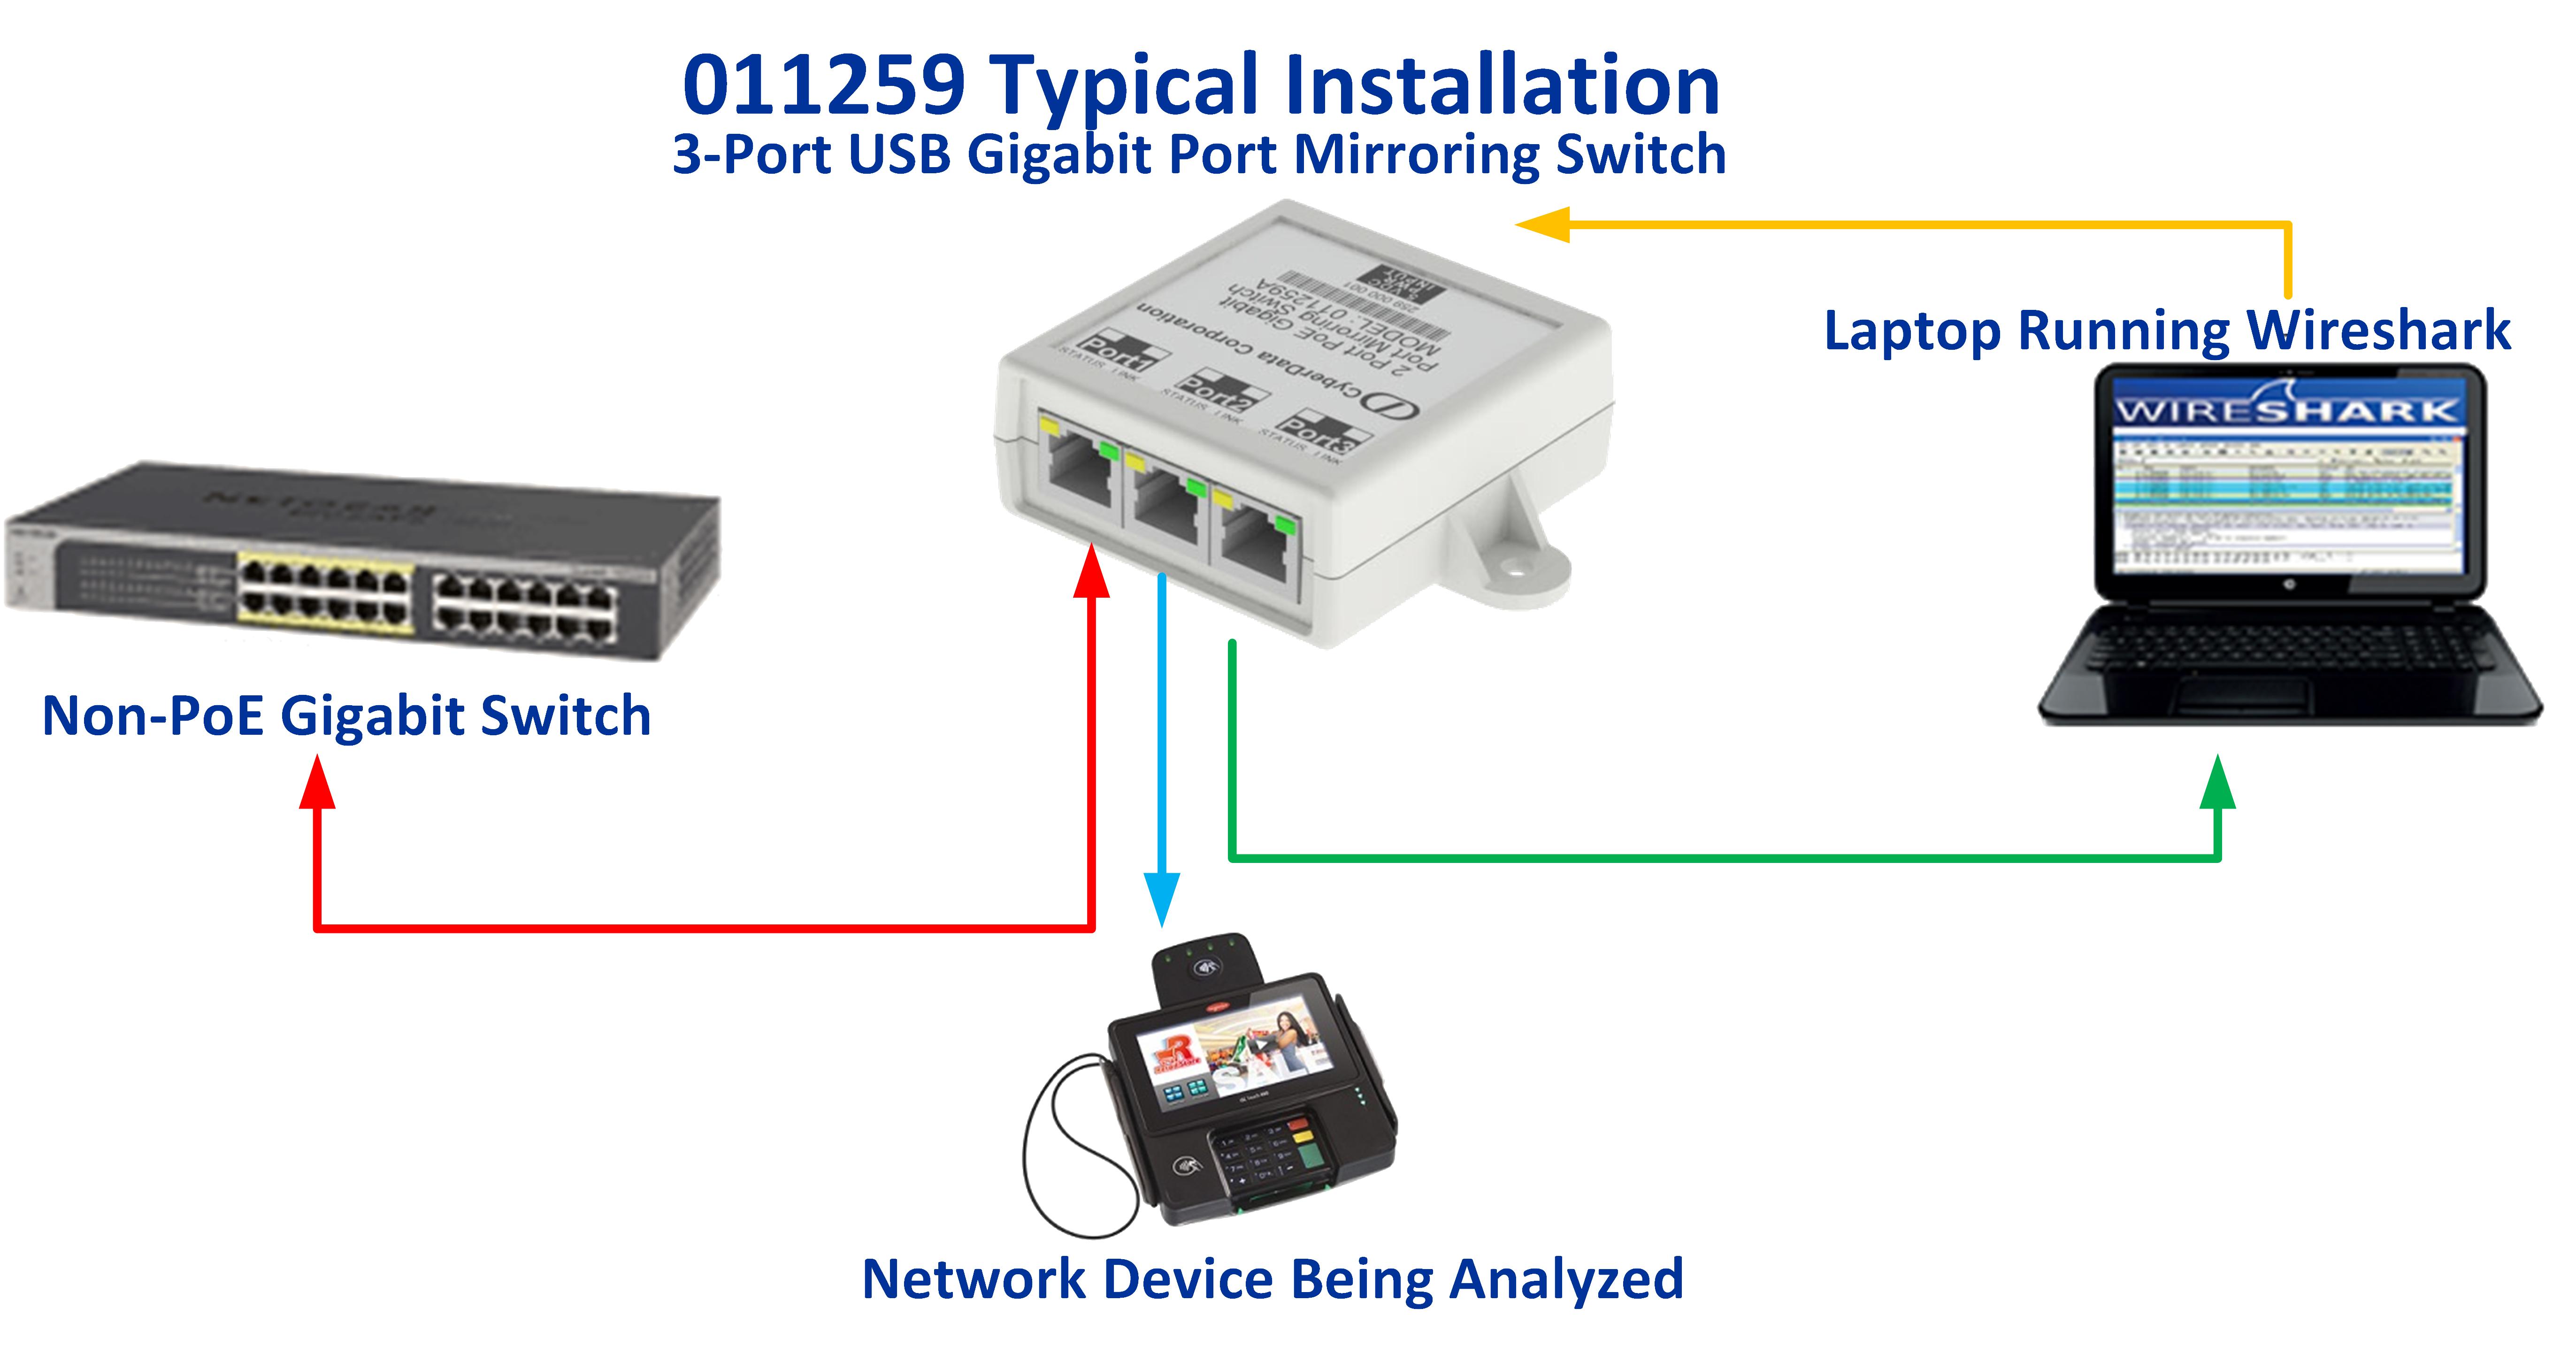 011259 2-Port USB Gigabit Port Mirroring Switch